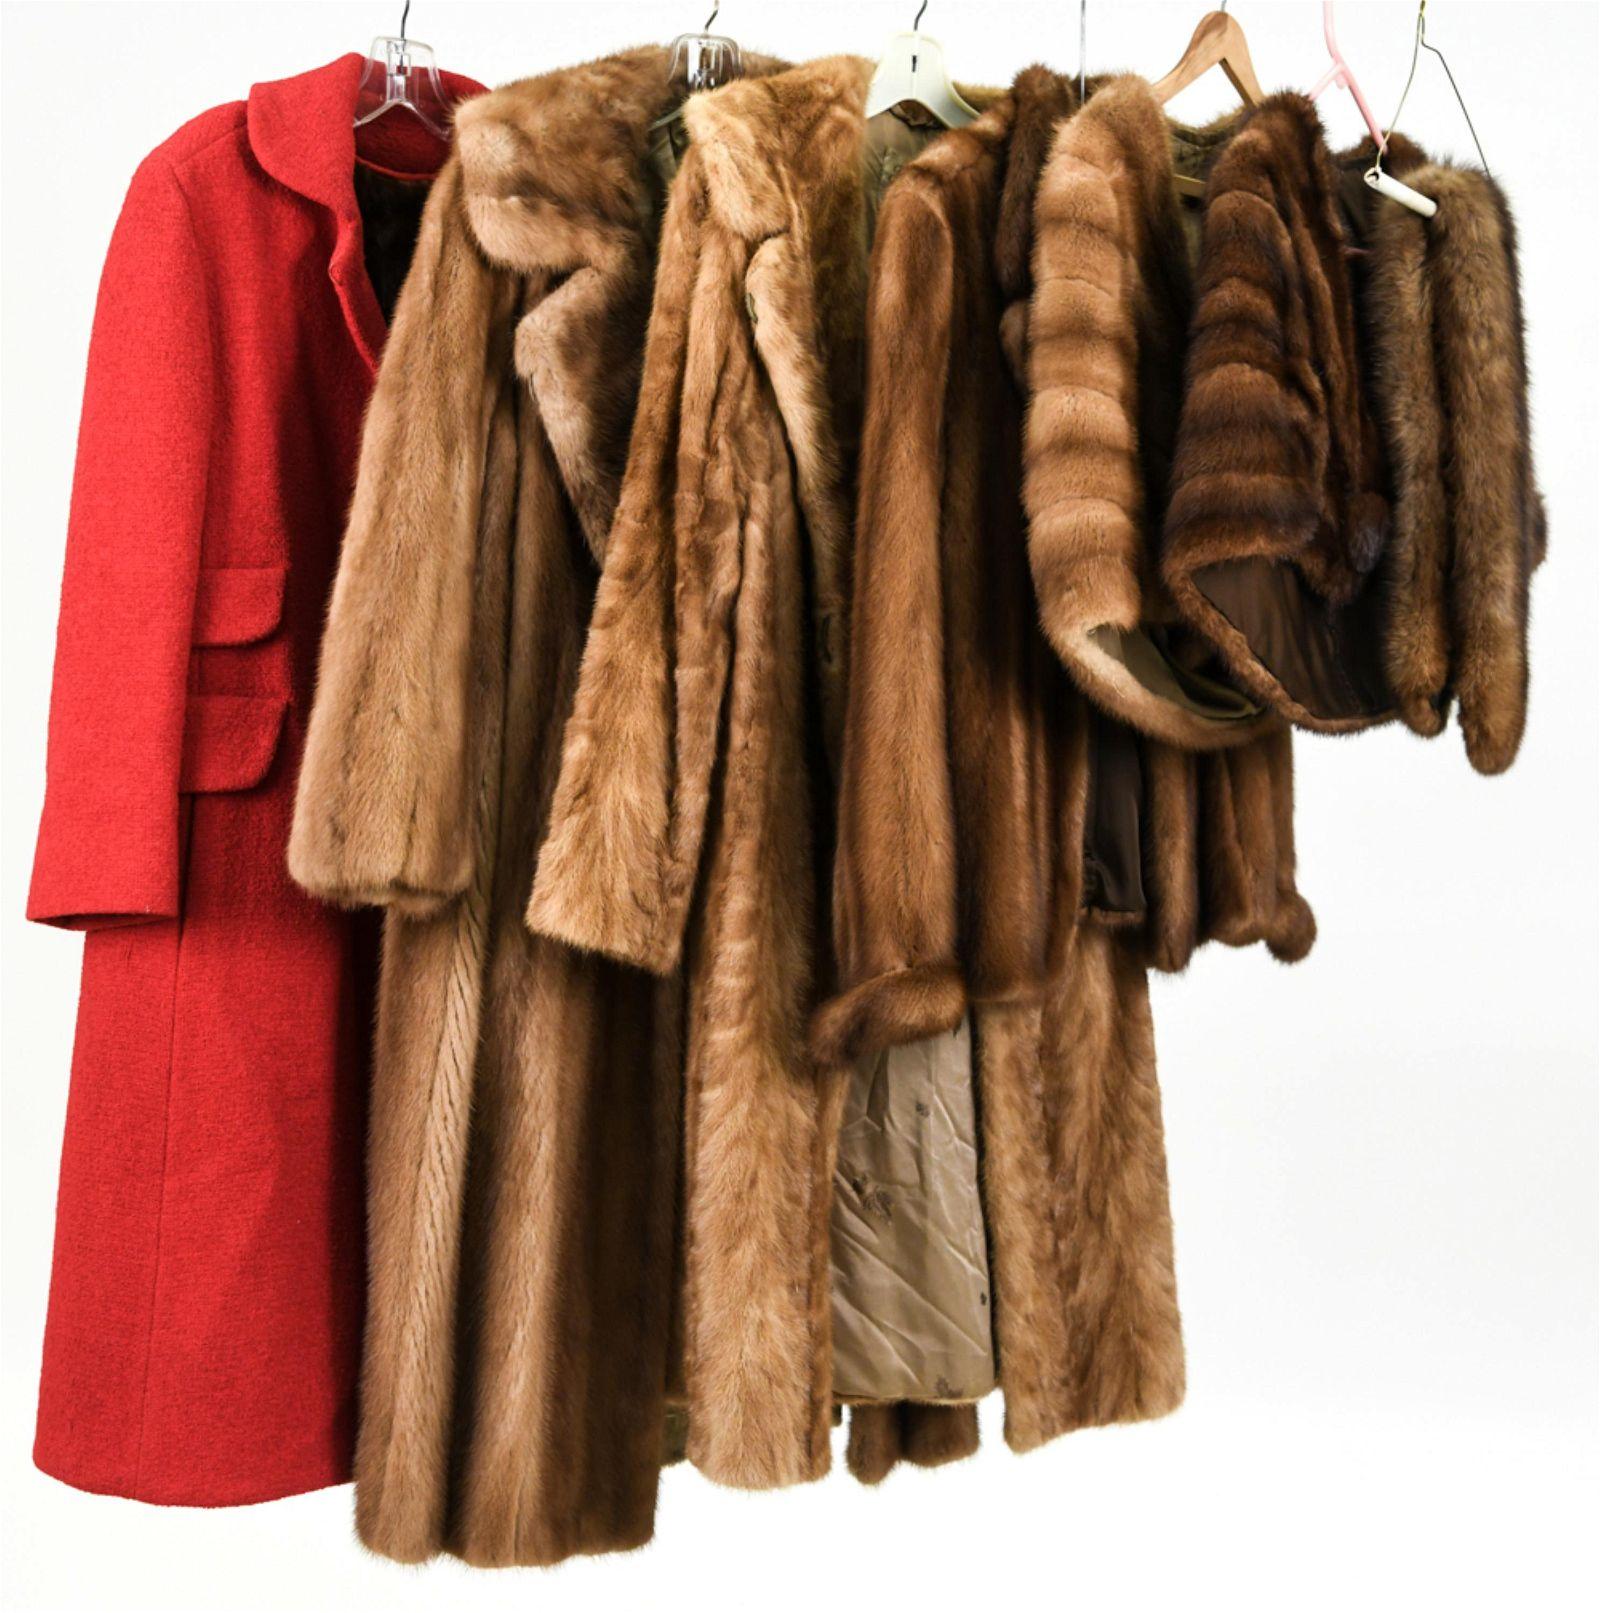 (7) VINTAGE FUR COATS, STOLES & COLLARS INCL. MINK